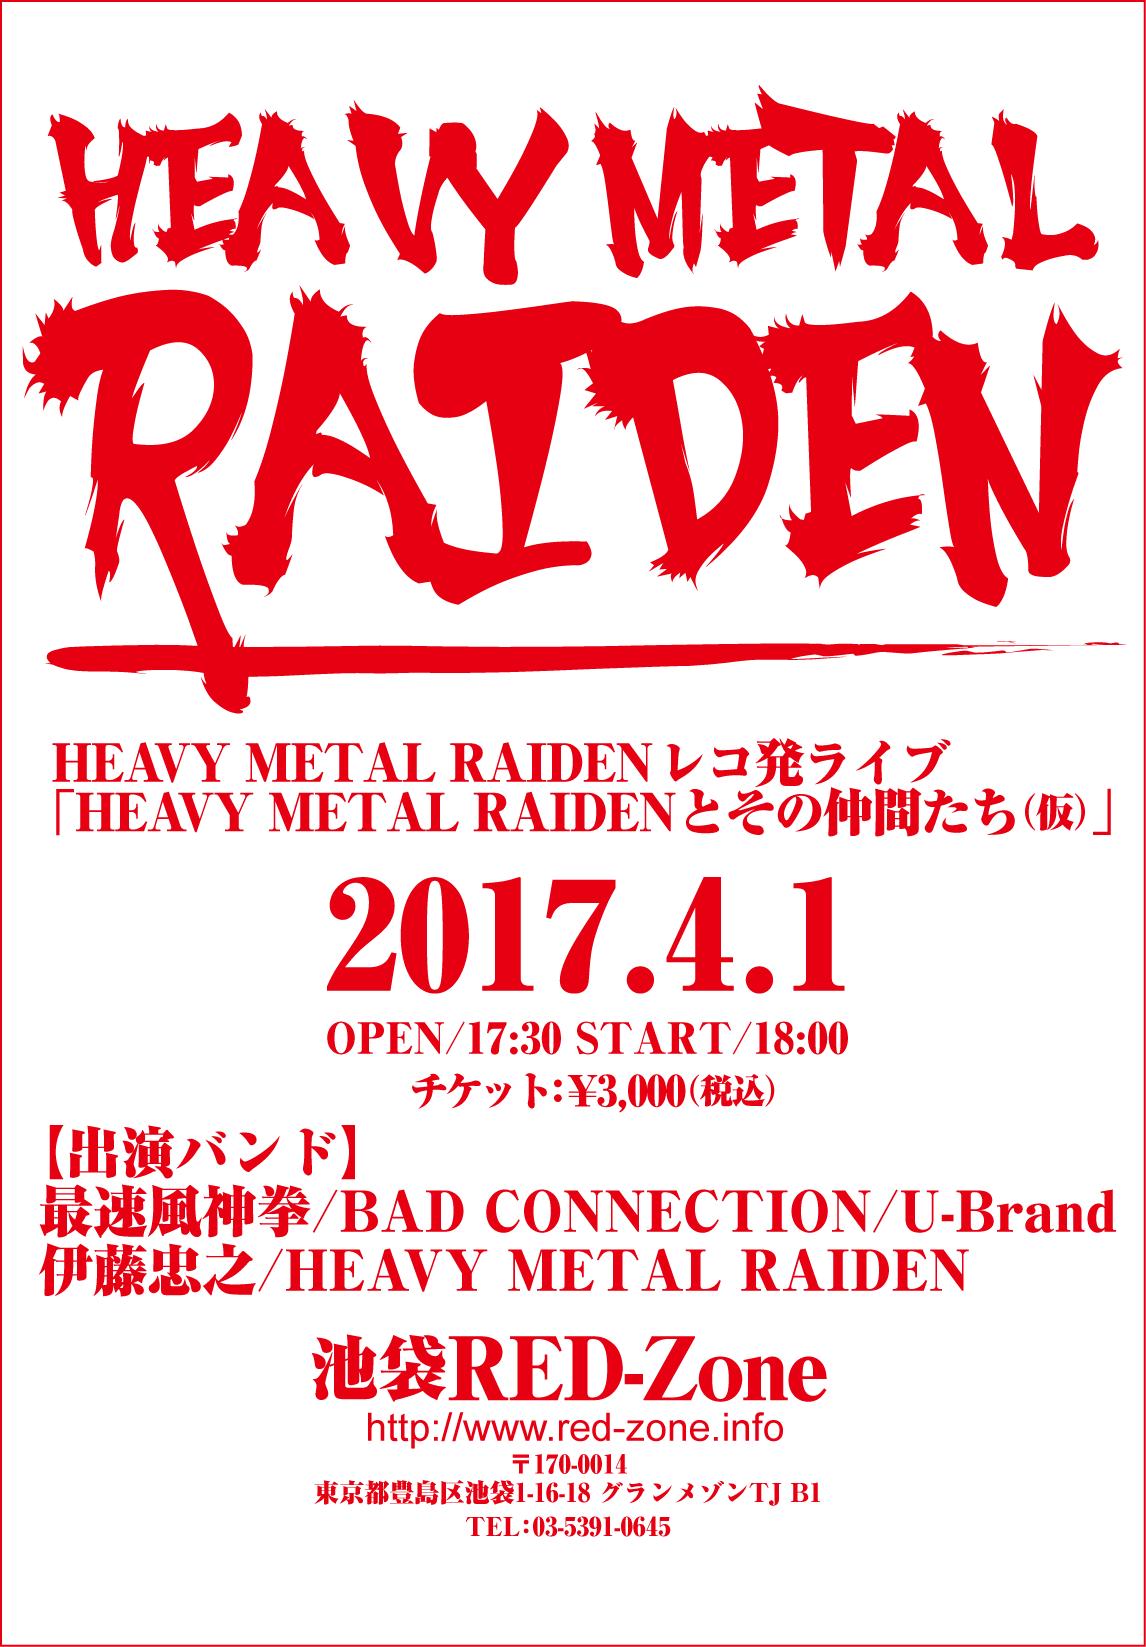 HEAVY METAL RAIDEN レコ発ライブ 「HEAVY METAL RAIDEN とその仲間たち(仮)」